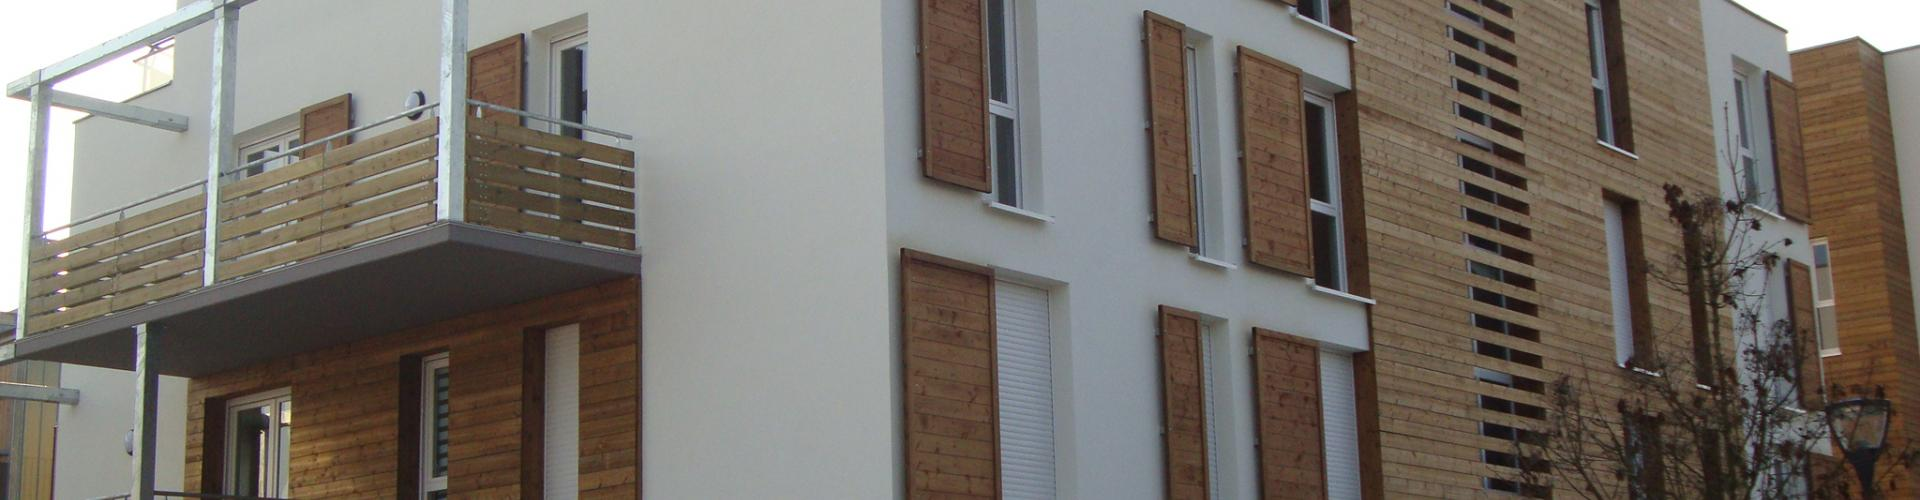 Programme immobilier neuf Strasbourg - Les Terrasses d'Apollon